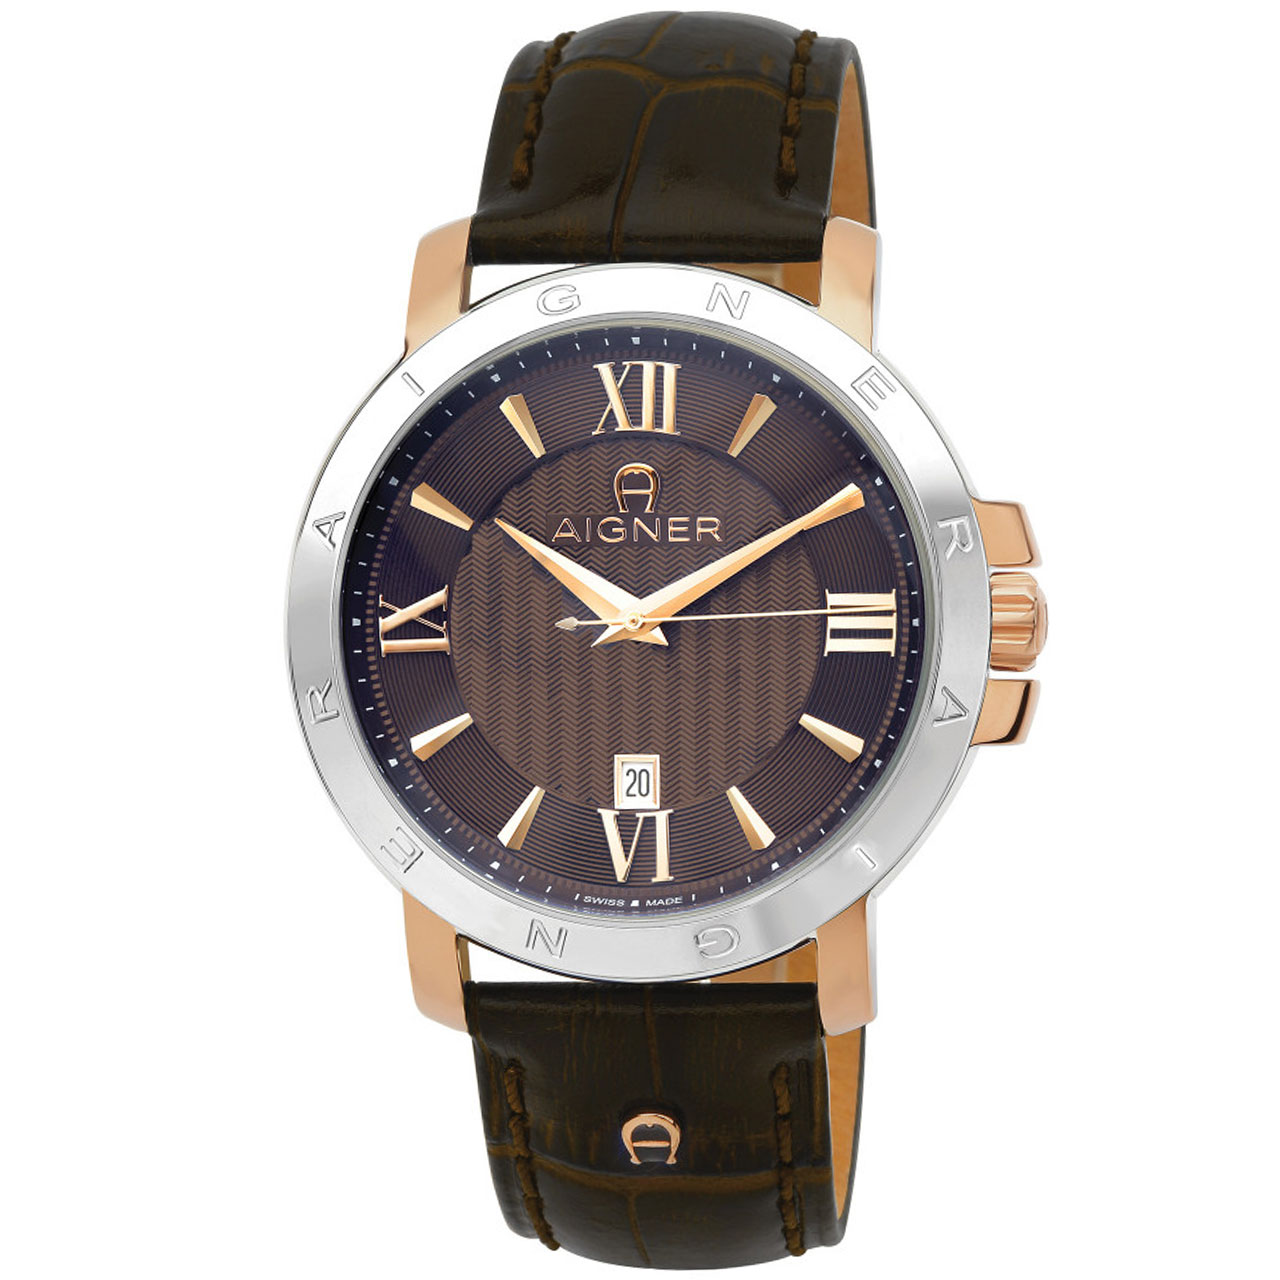 ساعت مچی عقربه ای مردانه اگنر مدل A09010 14